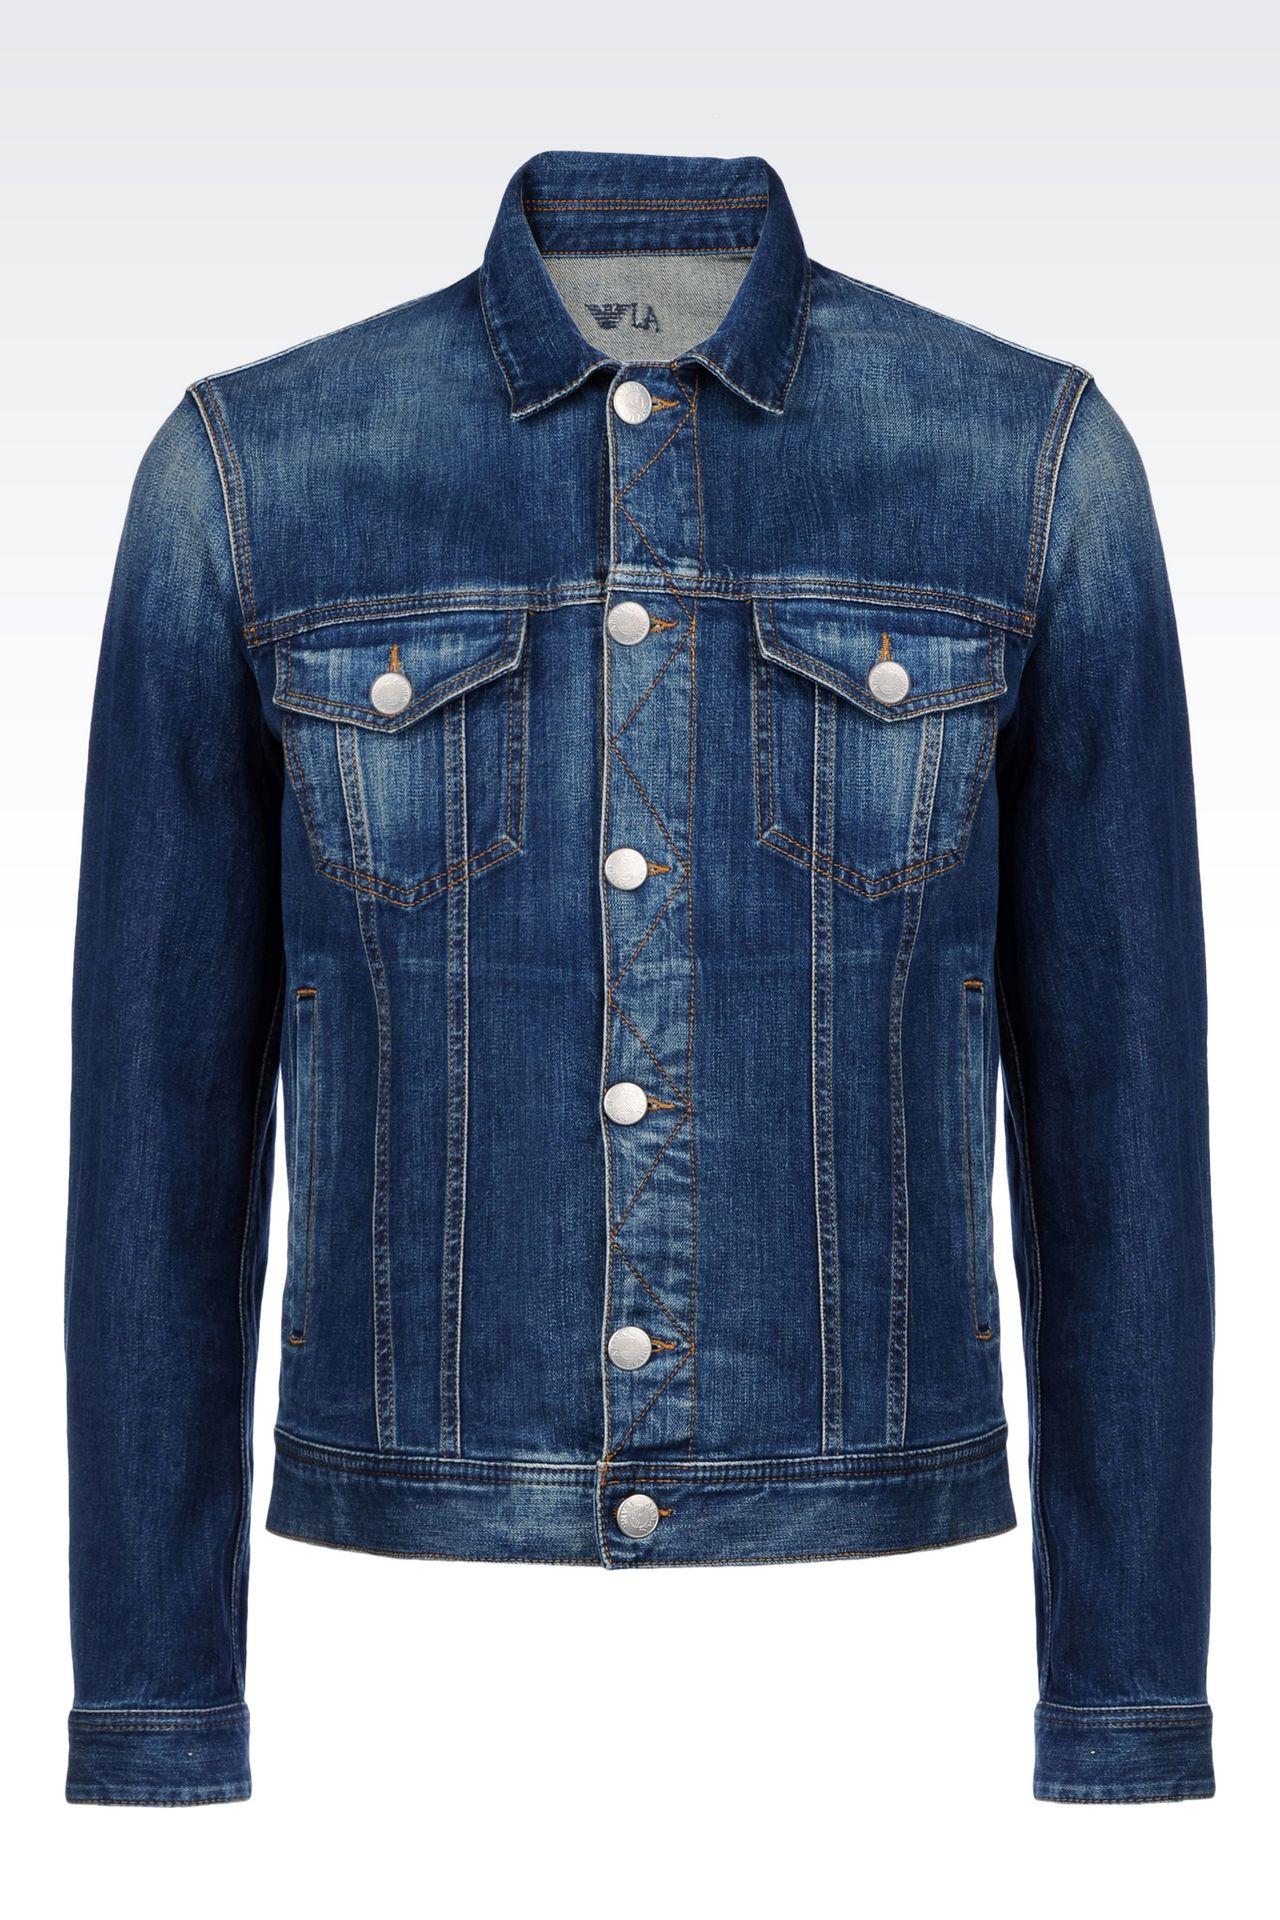 Armani Jeans Men DENIM JACKET, - Armani.com